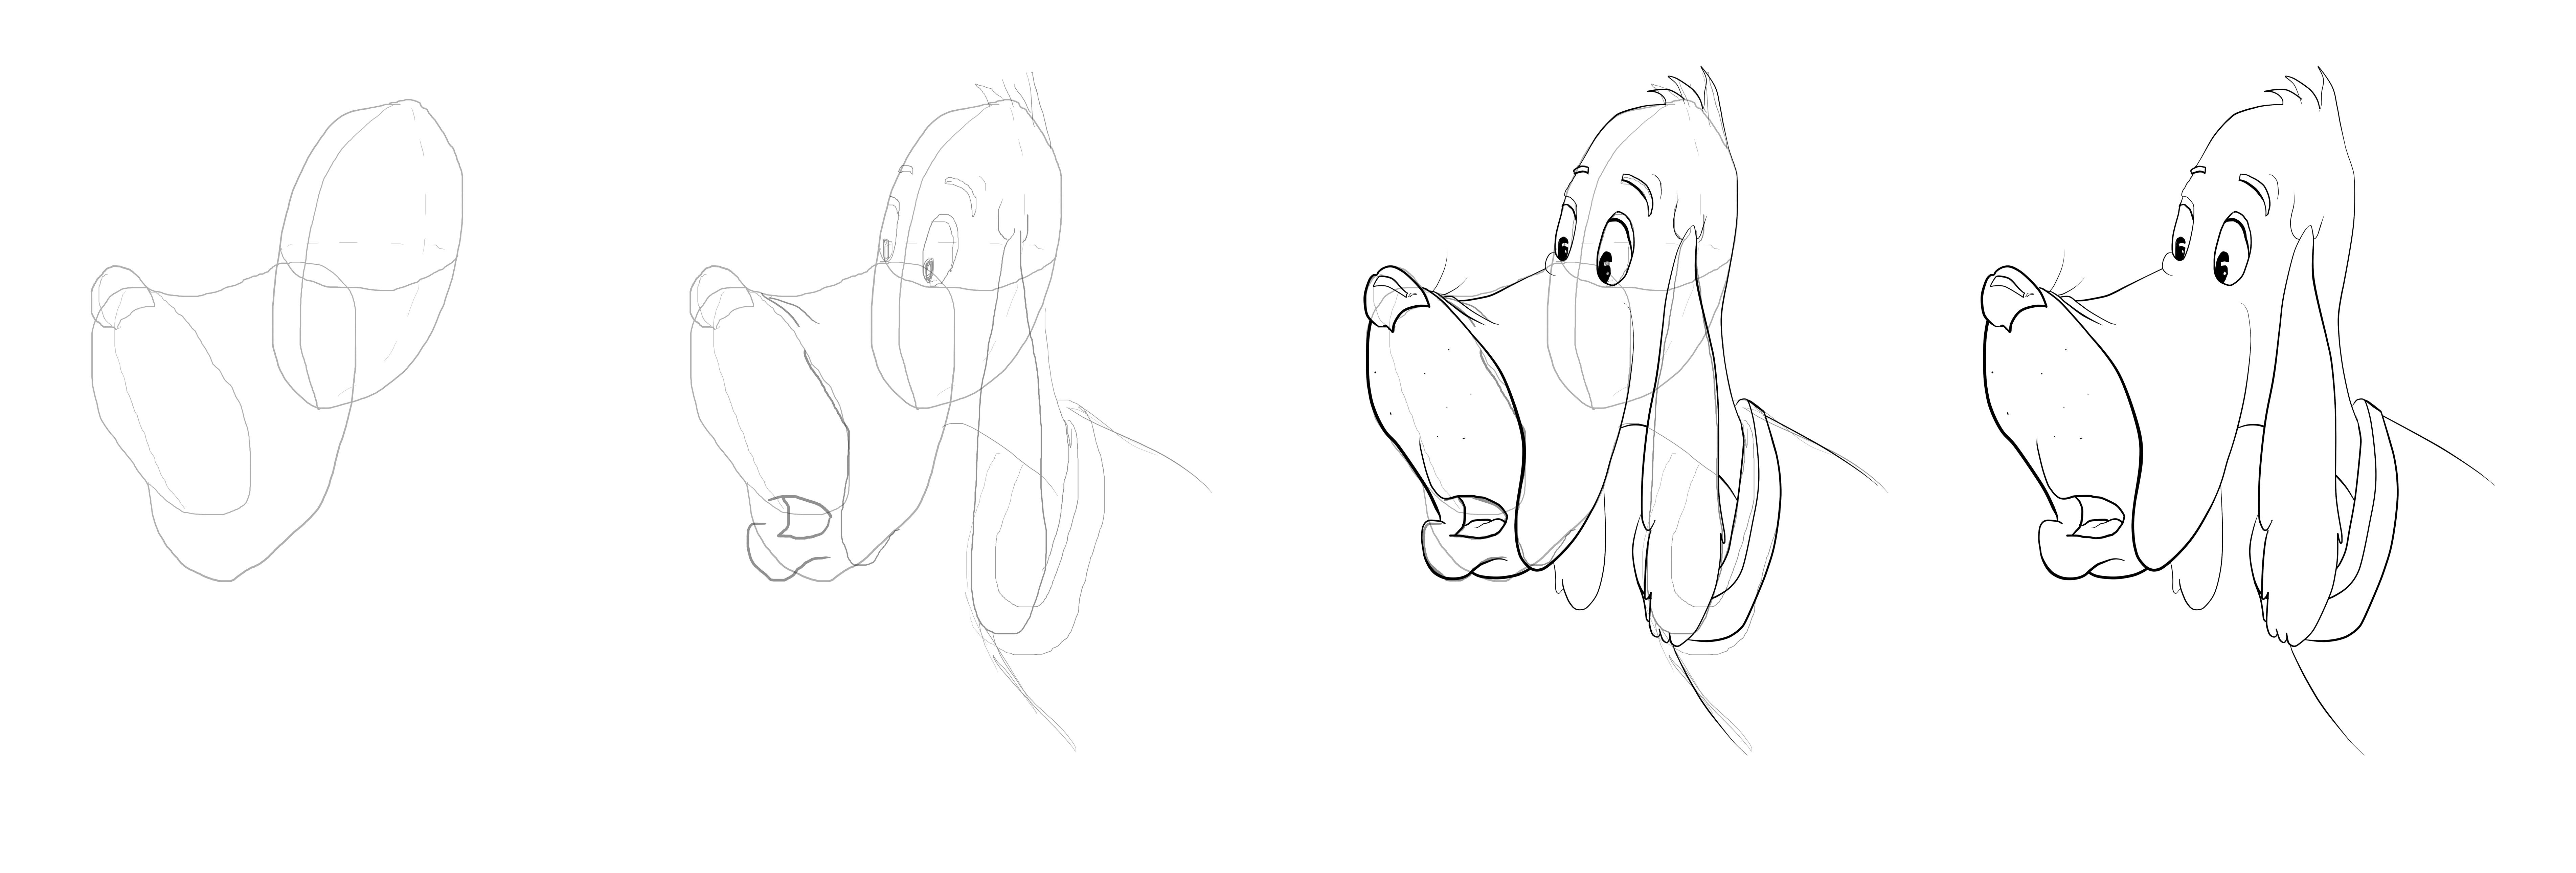 Cartoon Head Test 02